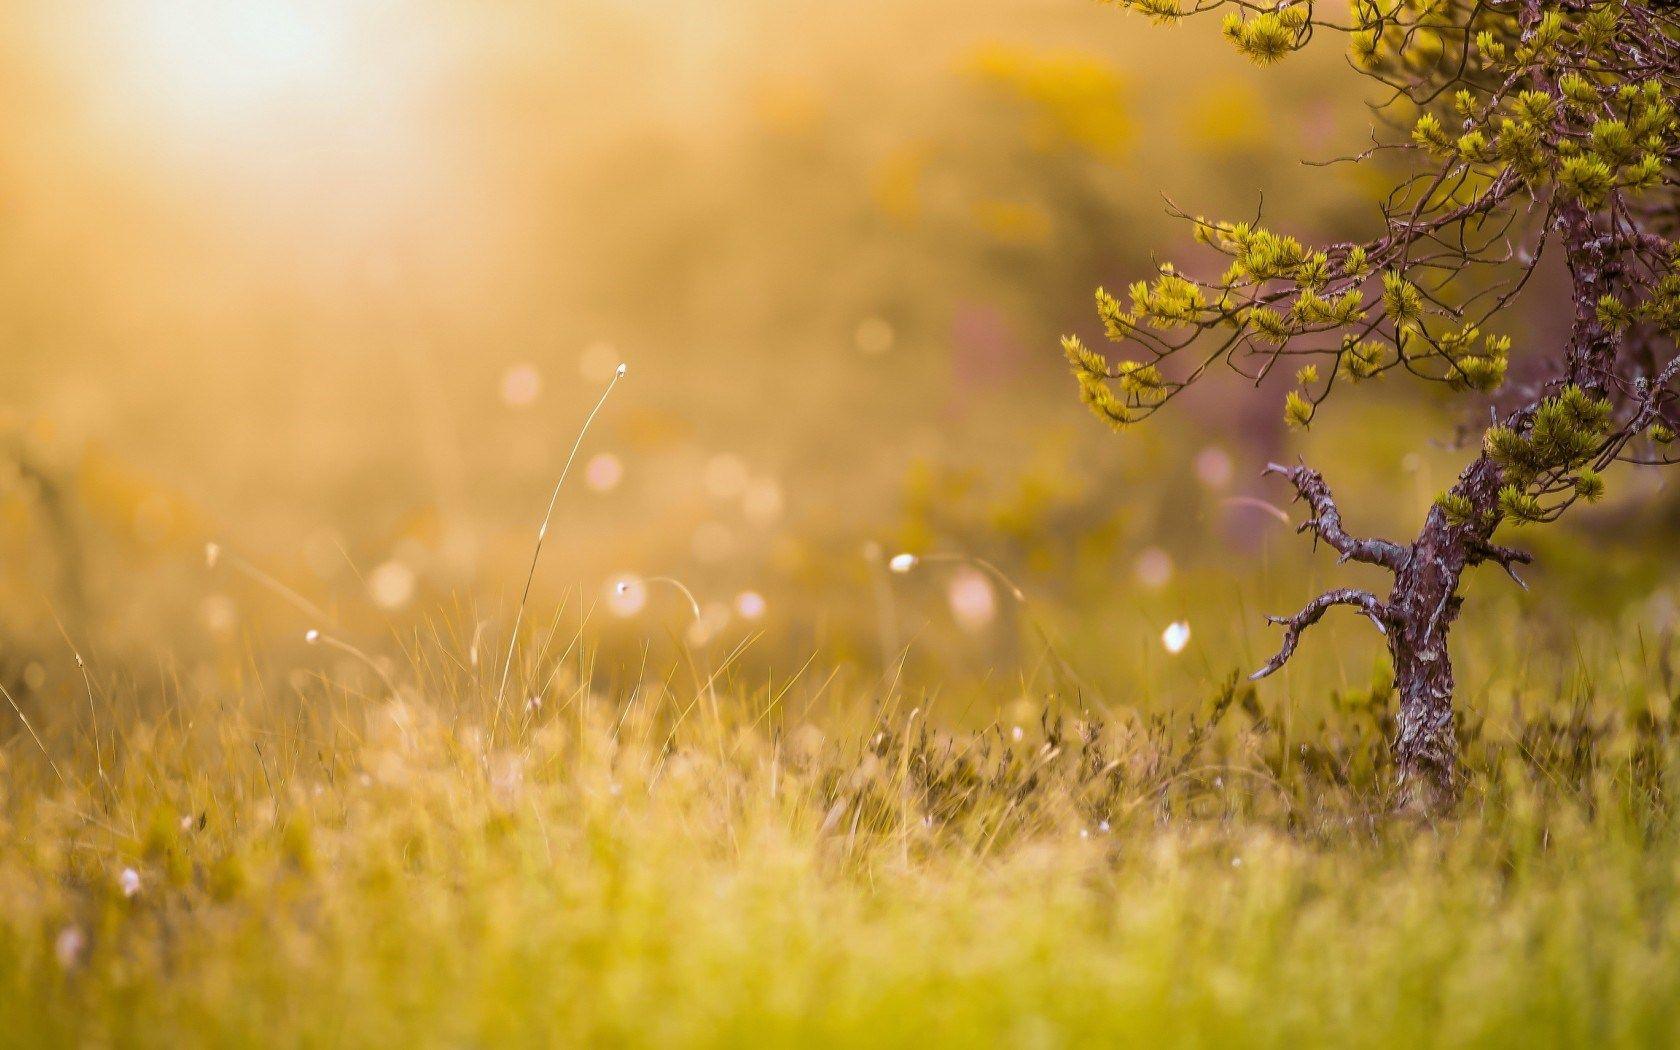 morning-sun-nature-wallpaper.jpg